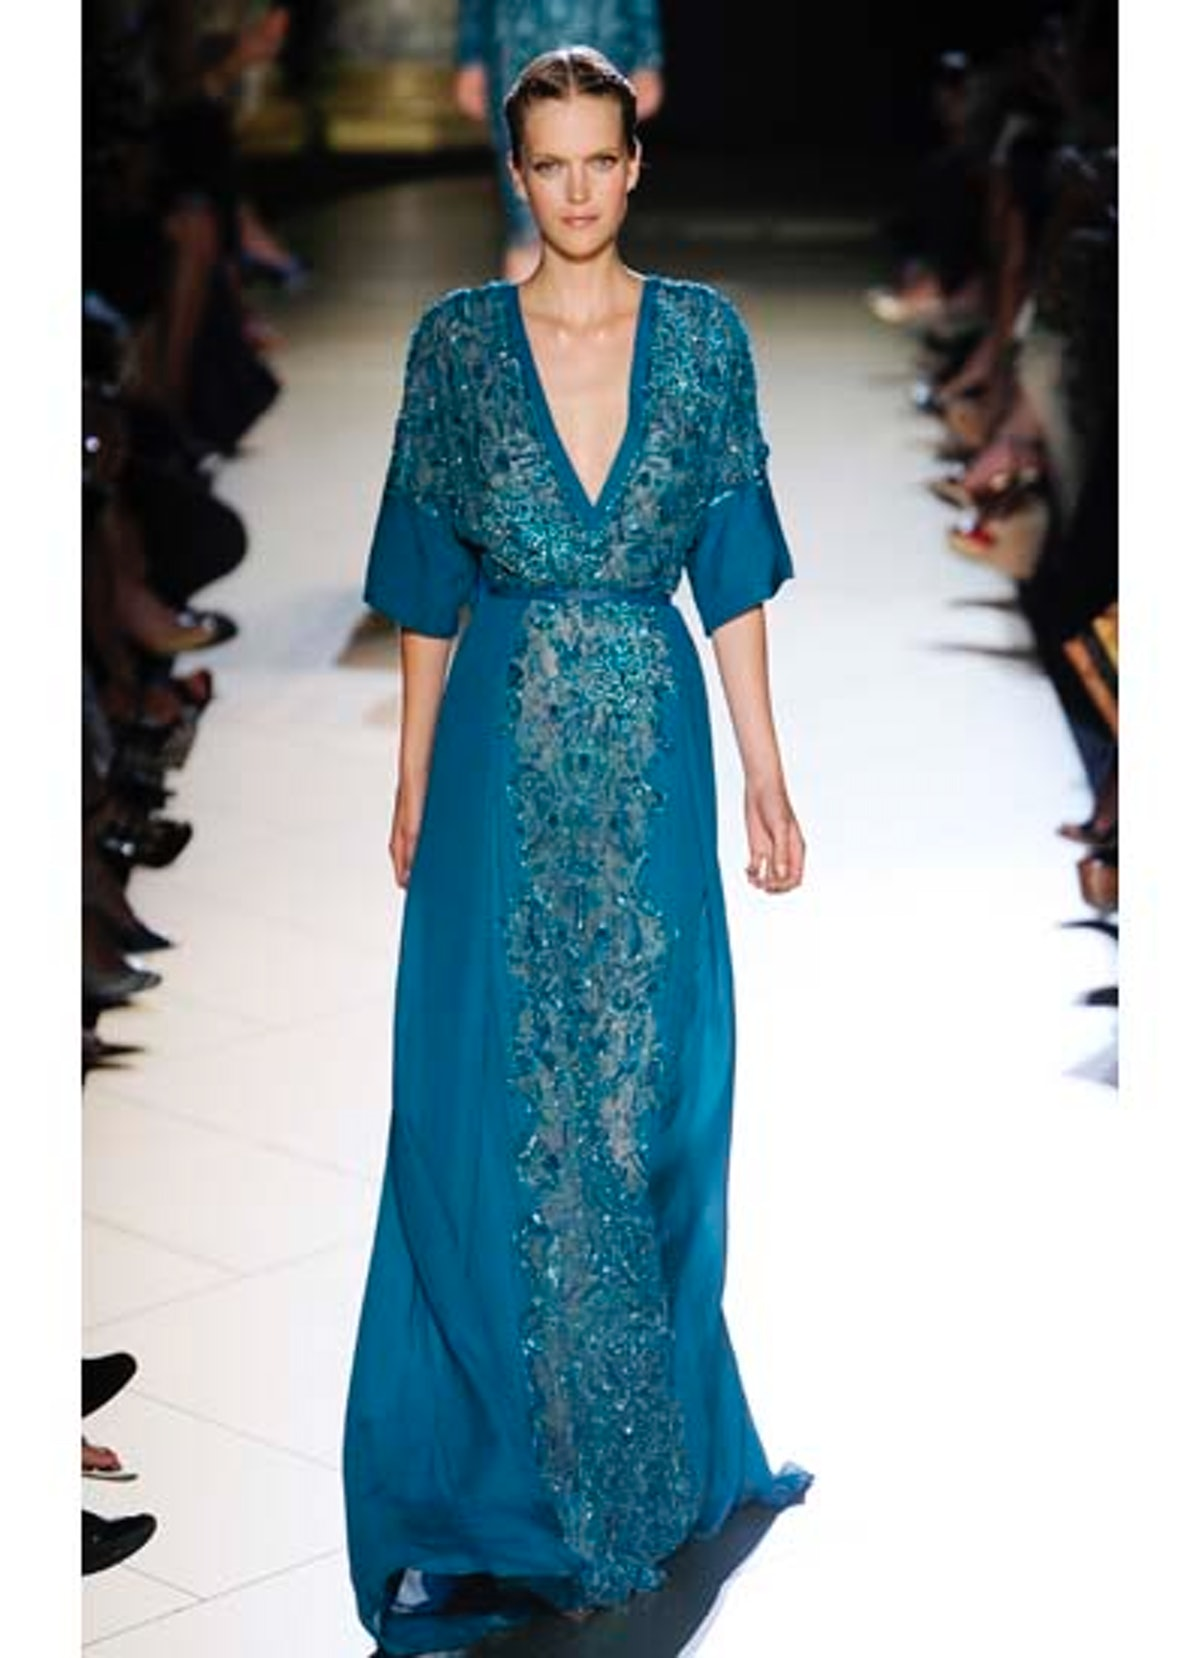 fass-elie-saab-couture-2012-runway-27-v.jpg